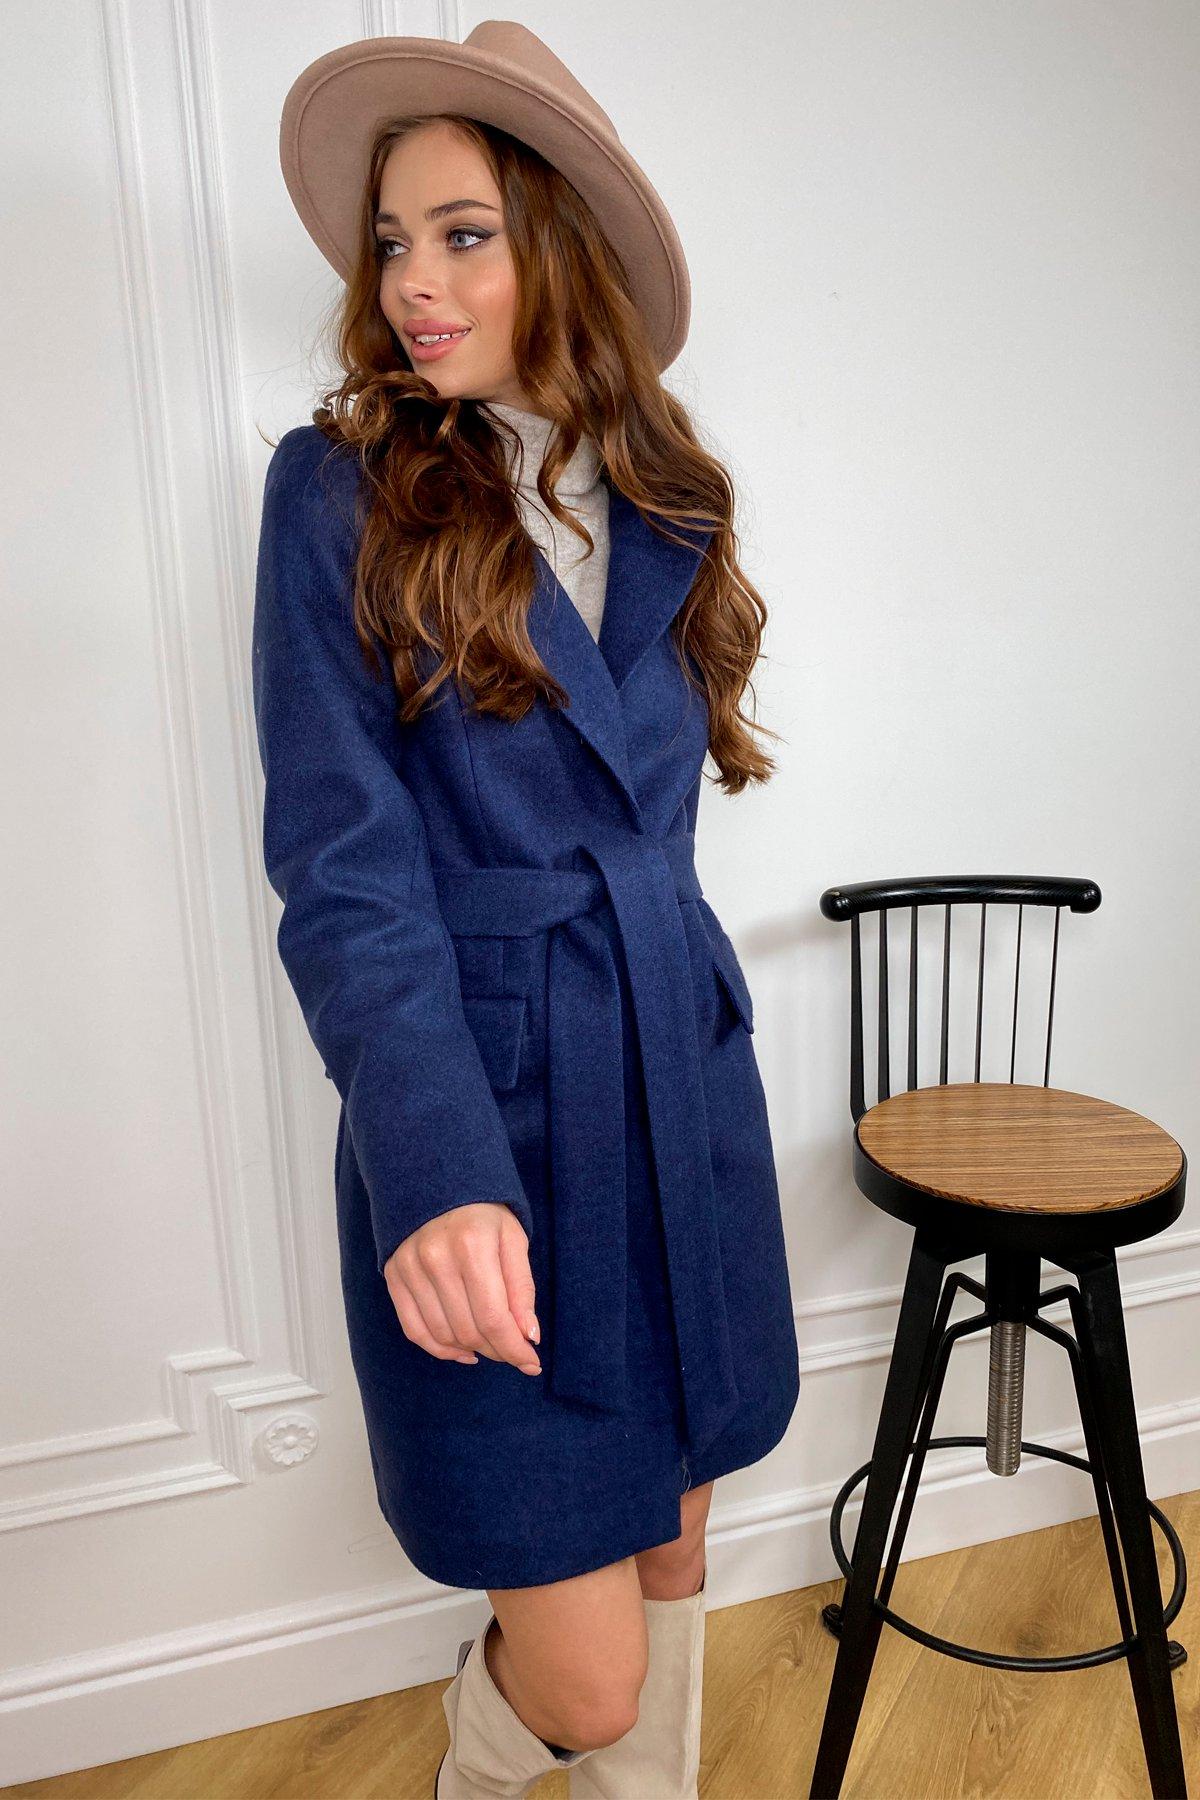 Корси кашемир меланж на трикотаже пальто 9827 АРТ. 46114 Цвет: Т.синий - фото 4, интернет магазин tm-modus.ru